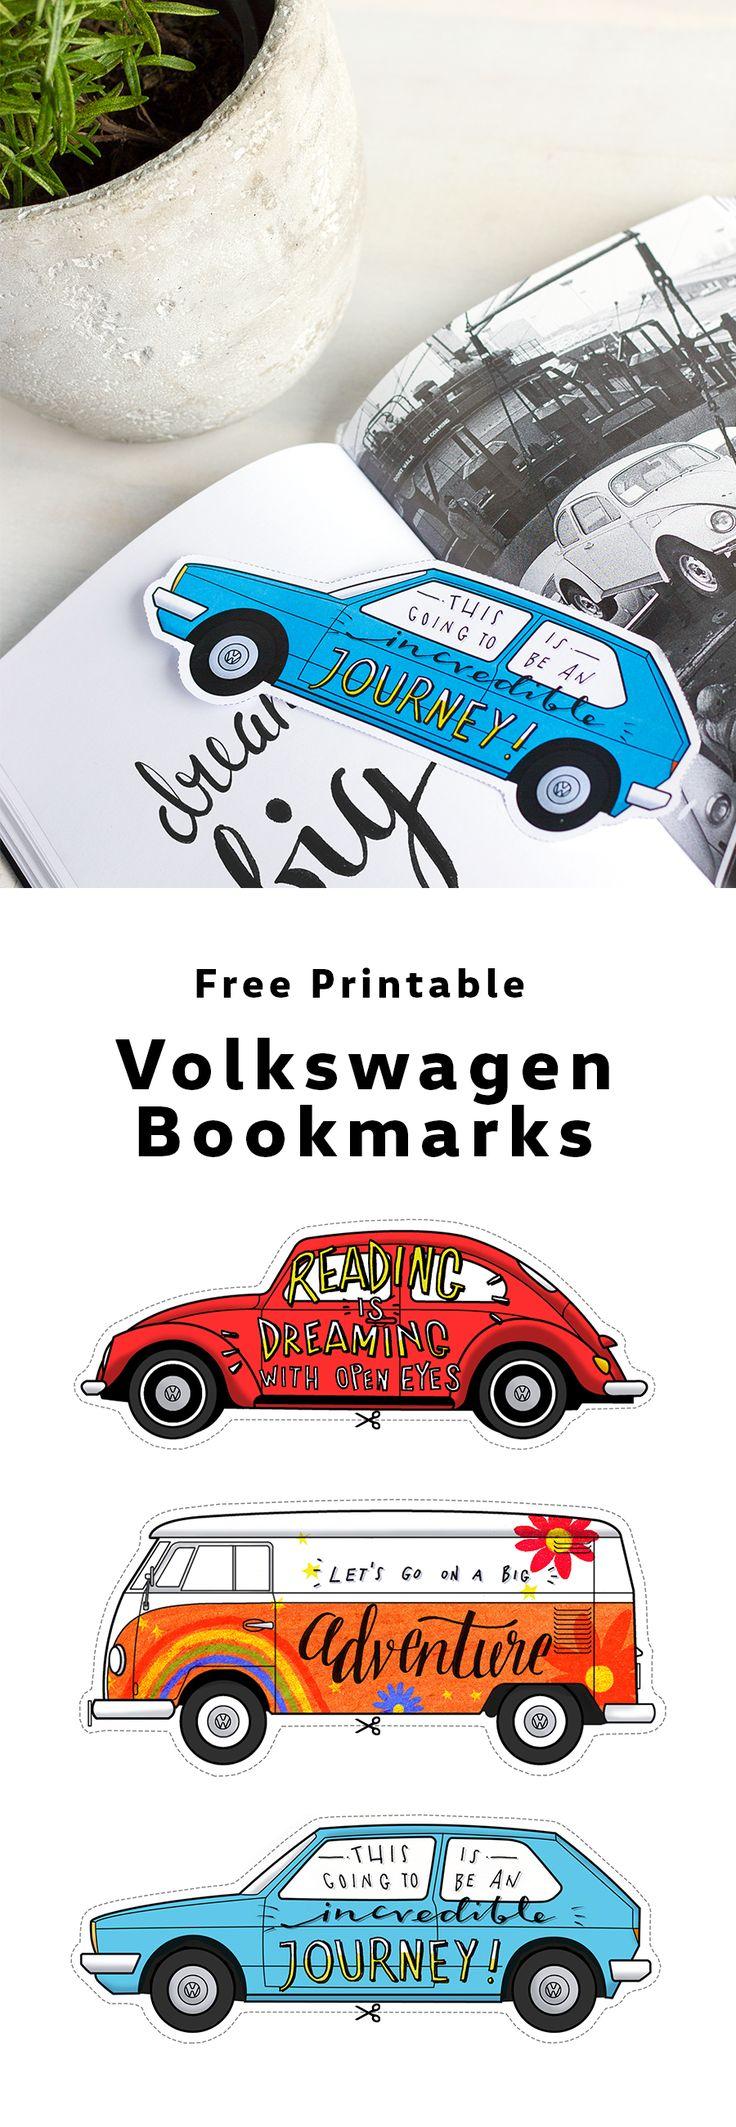 DIY for booklovers: Download this free printable to make Volkswagen Golf, Beetle or Campervan bookmarks.